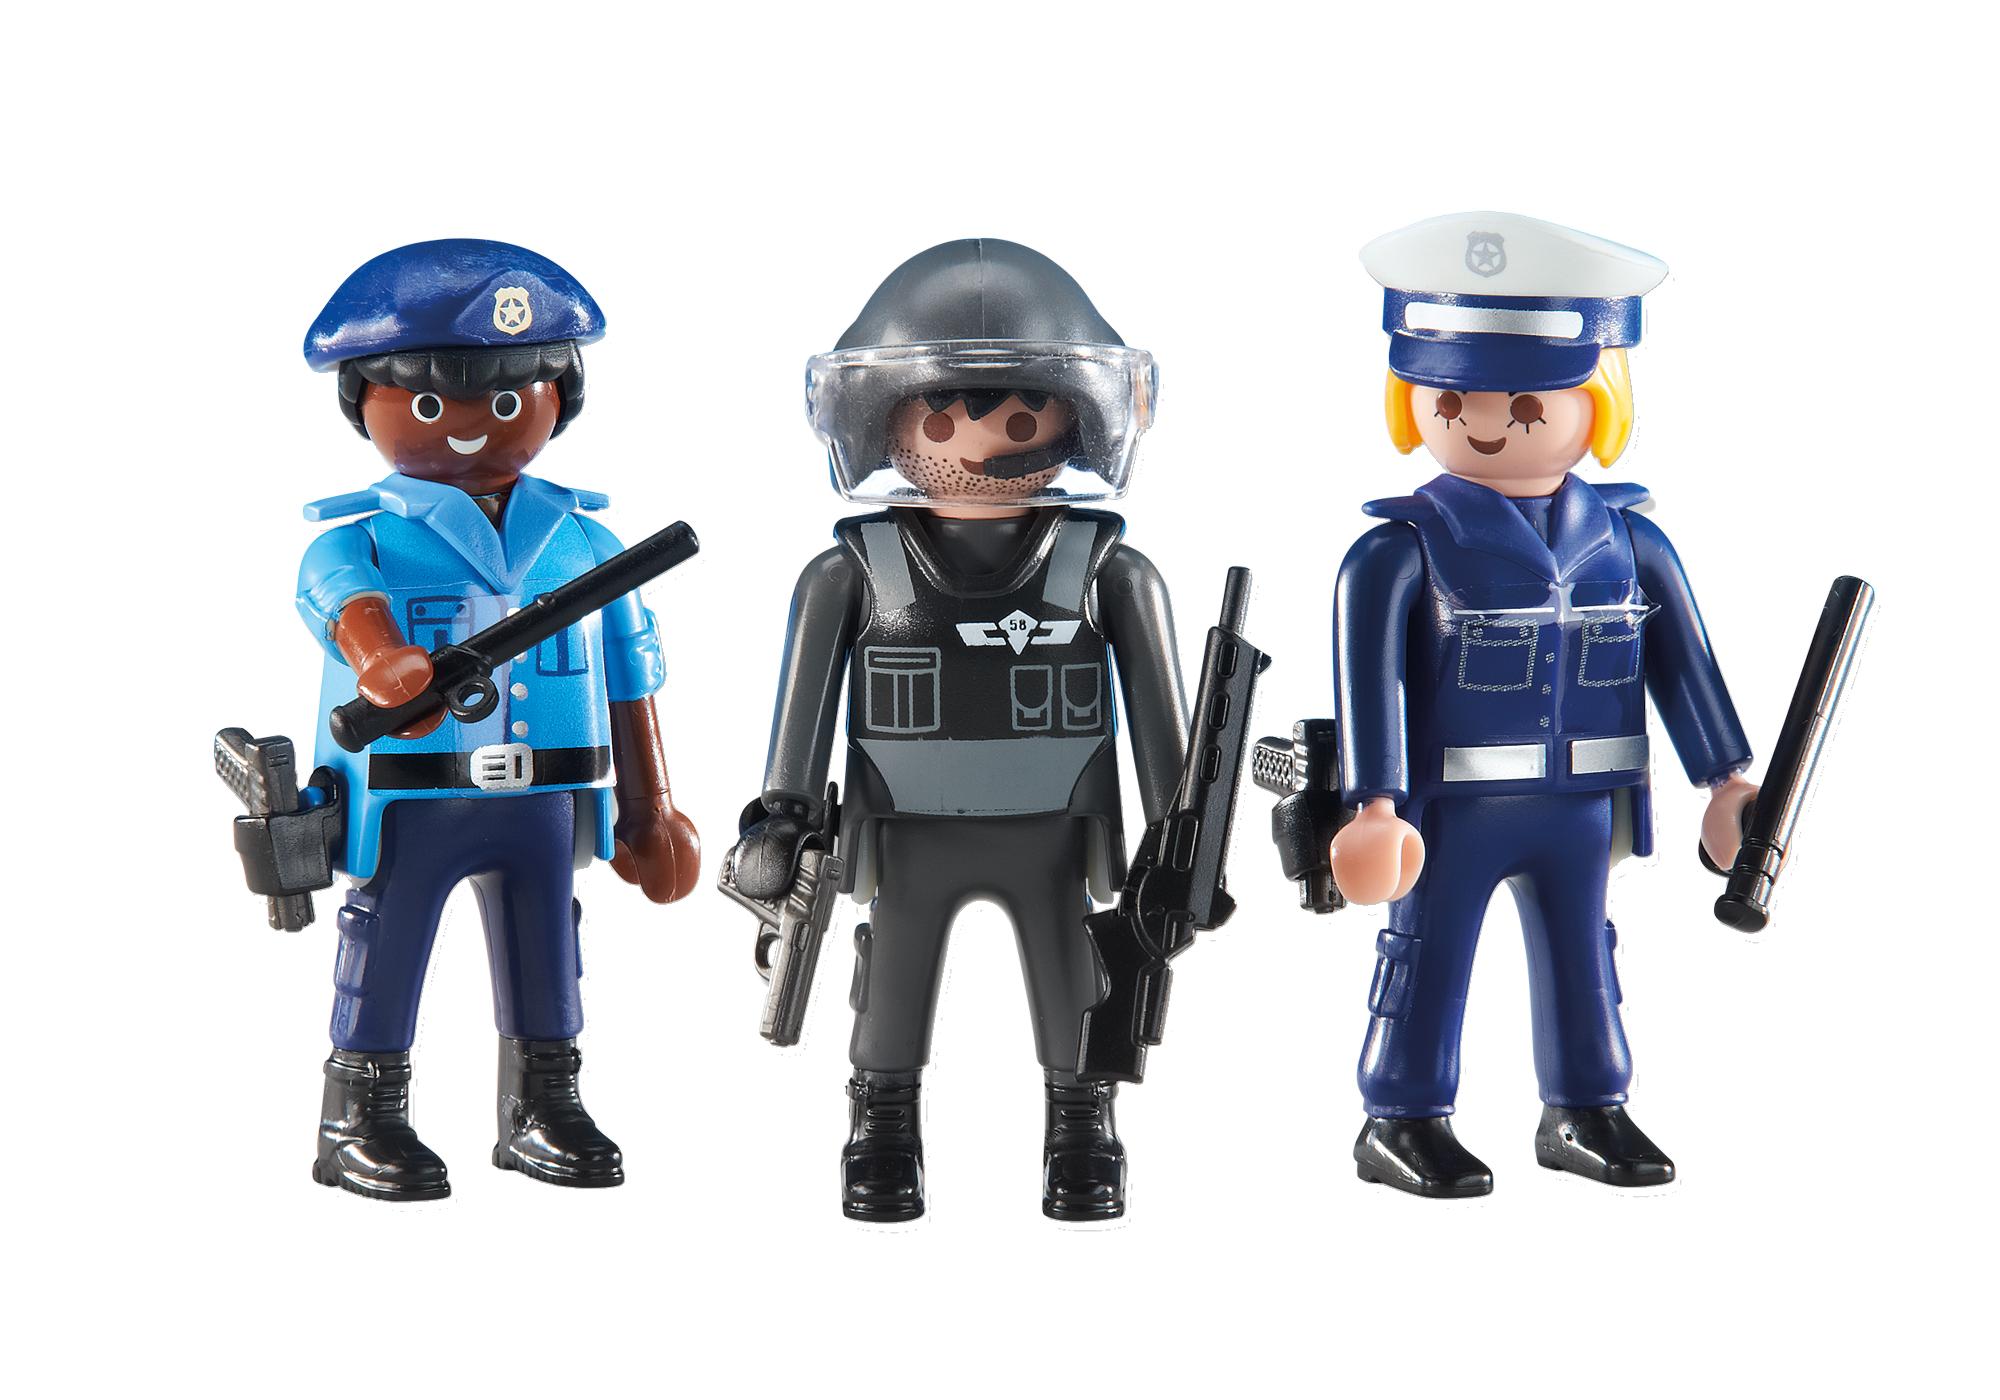 http://media.playmobil.com/i/playmobil/6501_product_detail/Policemen and Policewoman